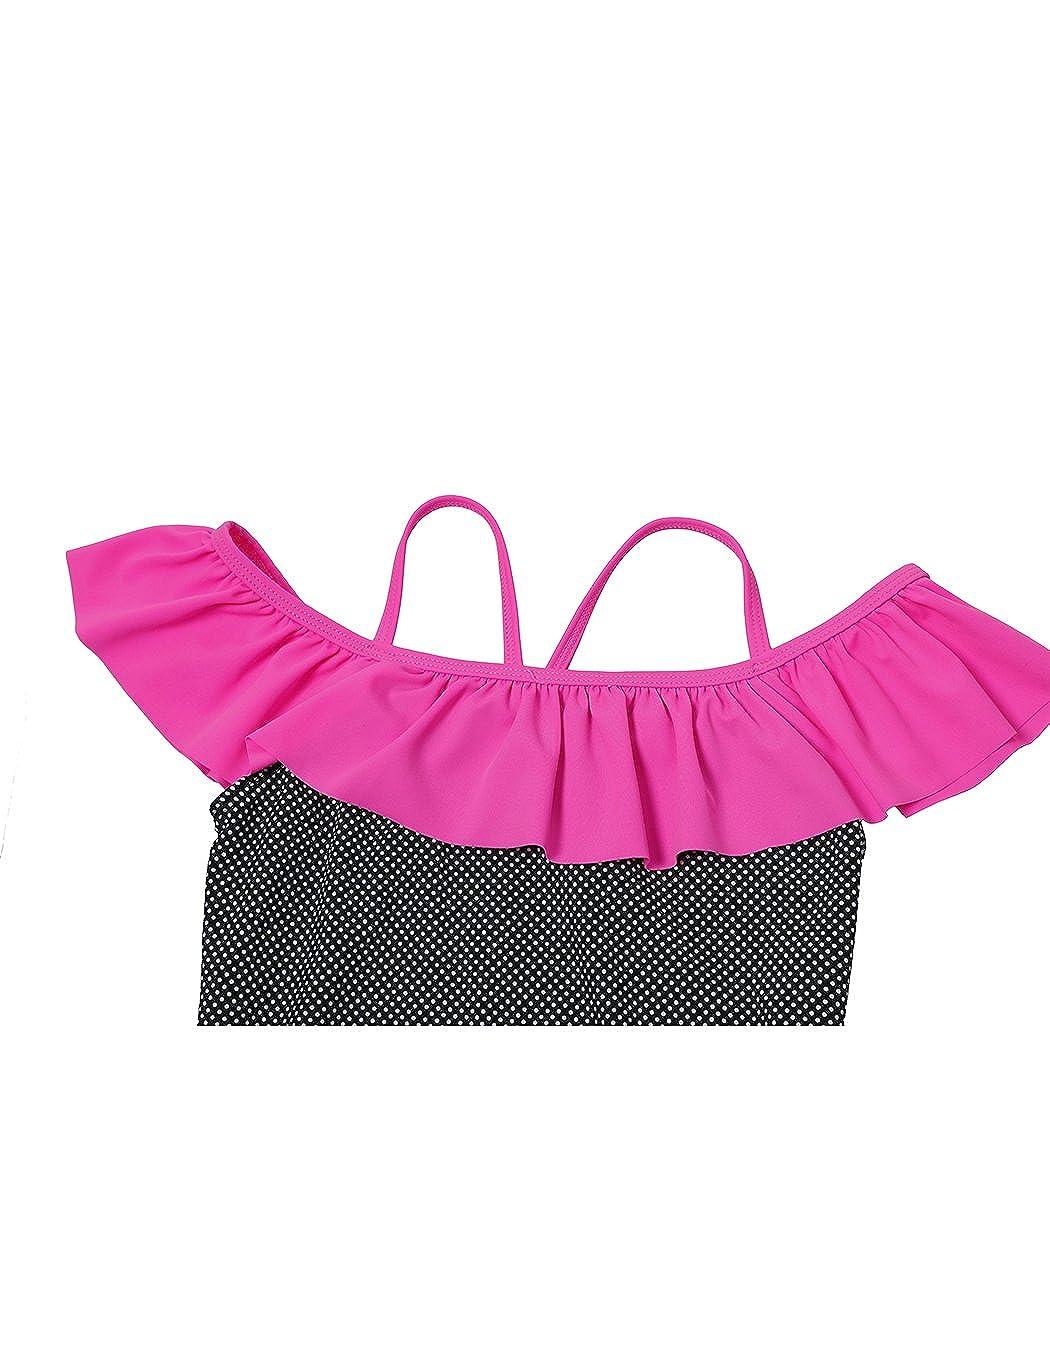 iDrawl Girls Ruffle Swimwear Bathing Suit Sun Protection Swimsuit One Piece UPF 50